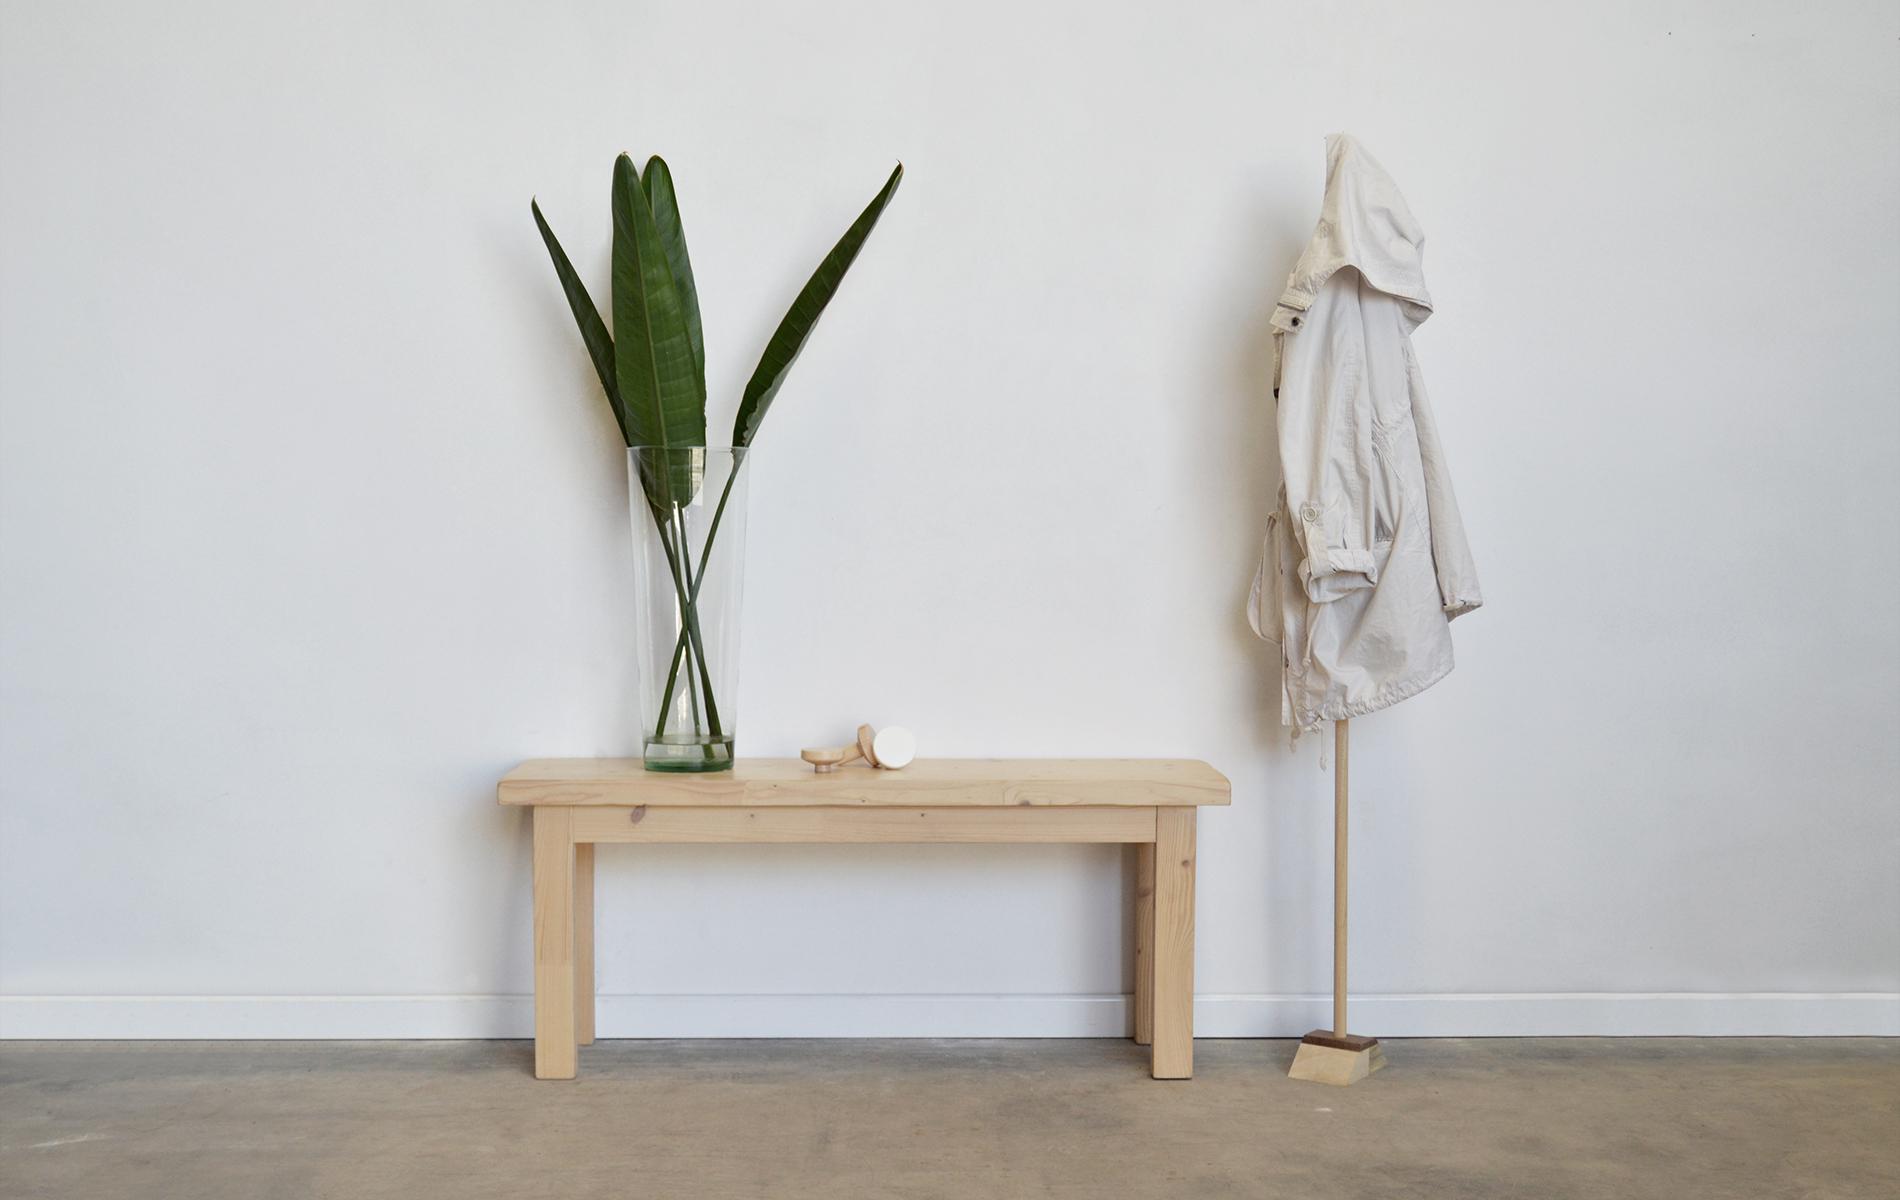 banco de madera estilo nórdico